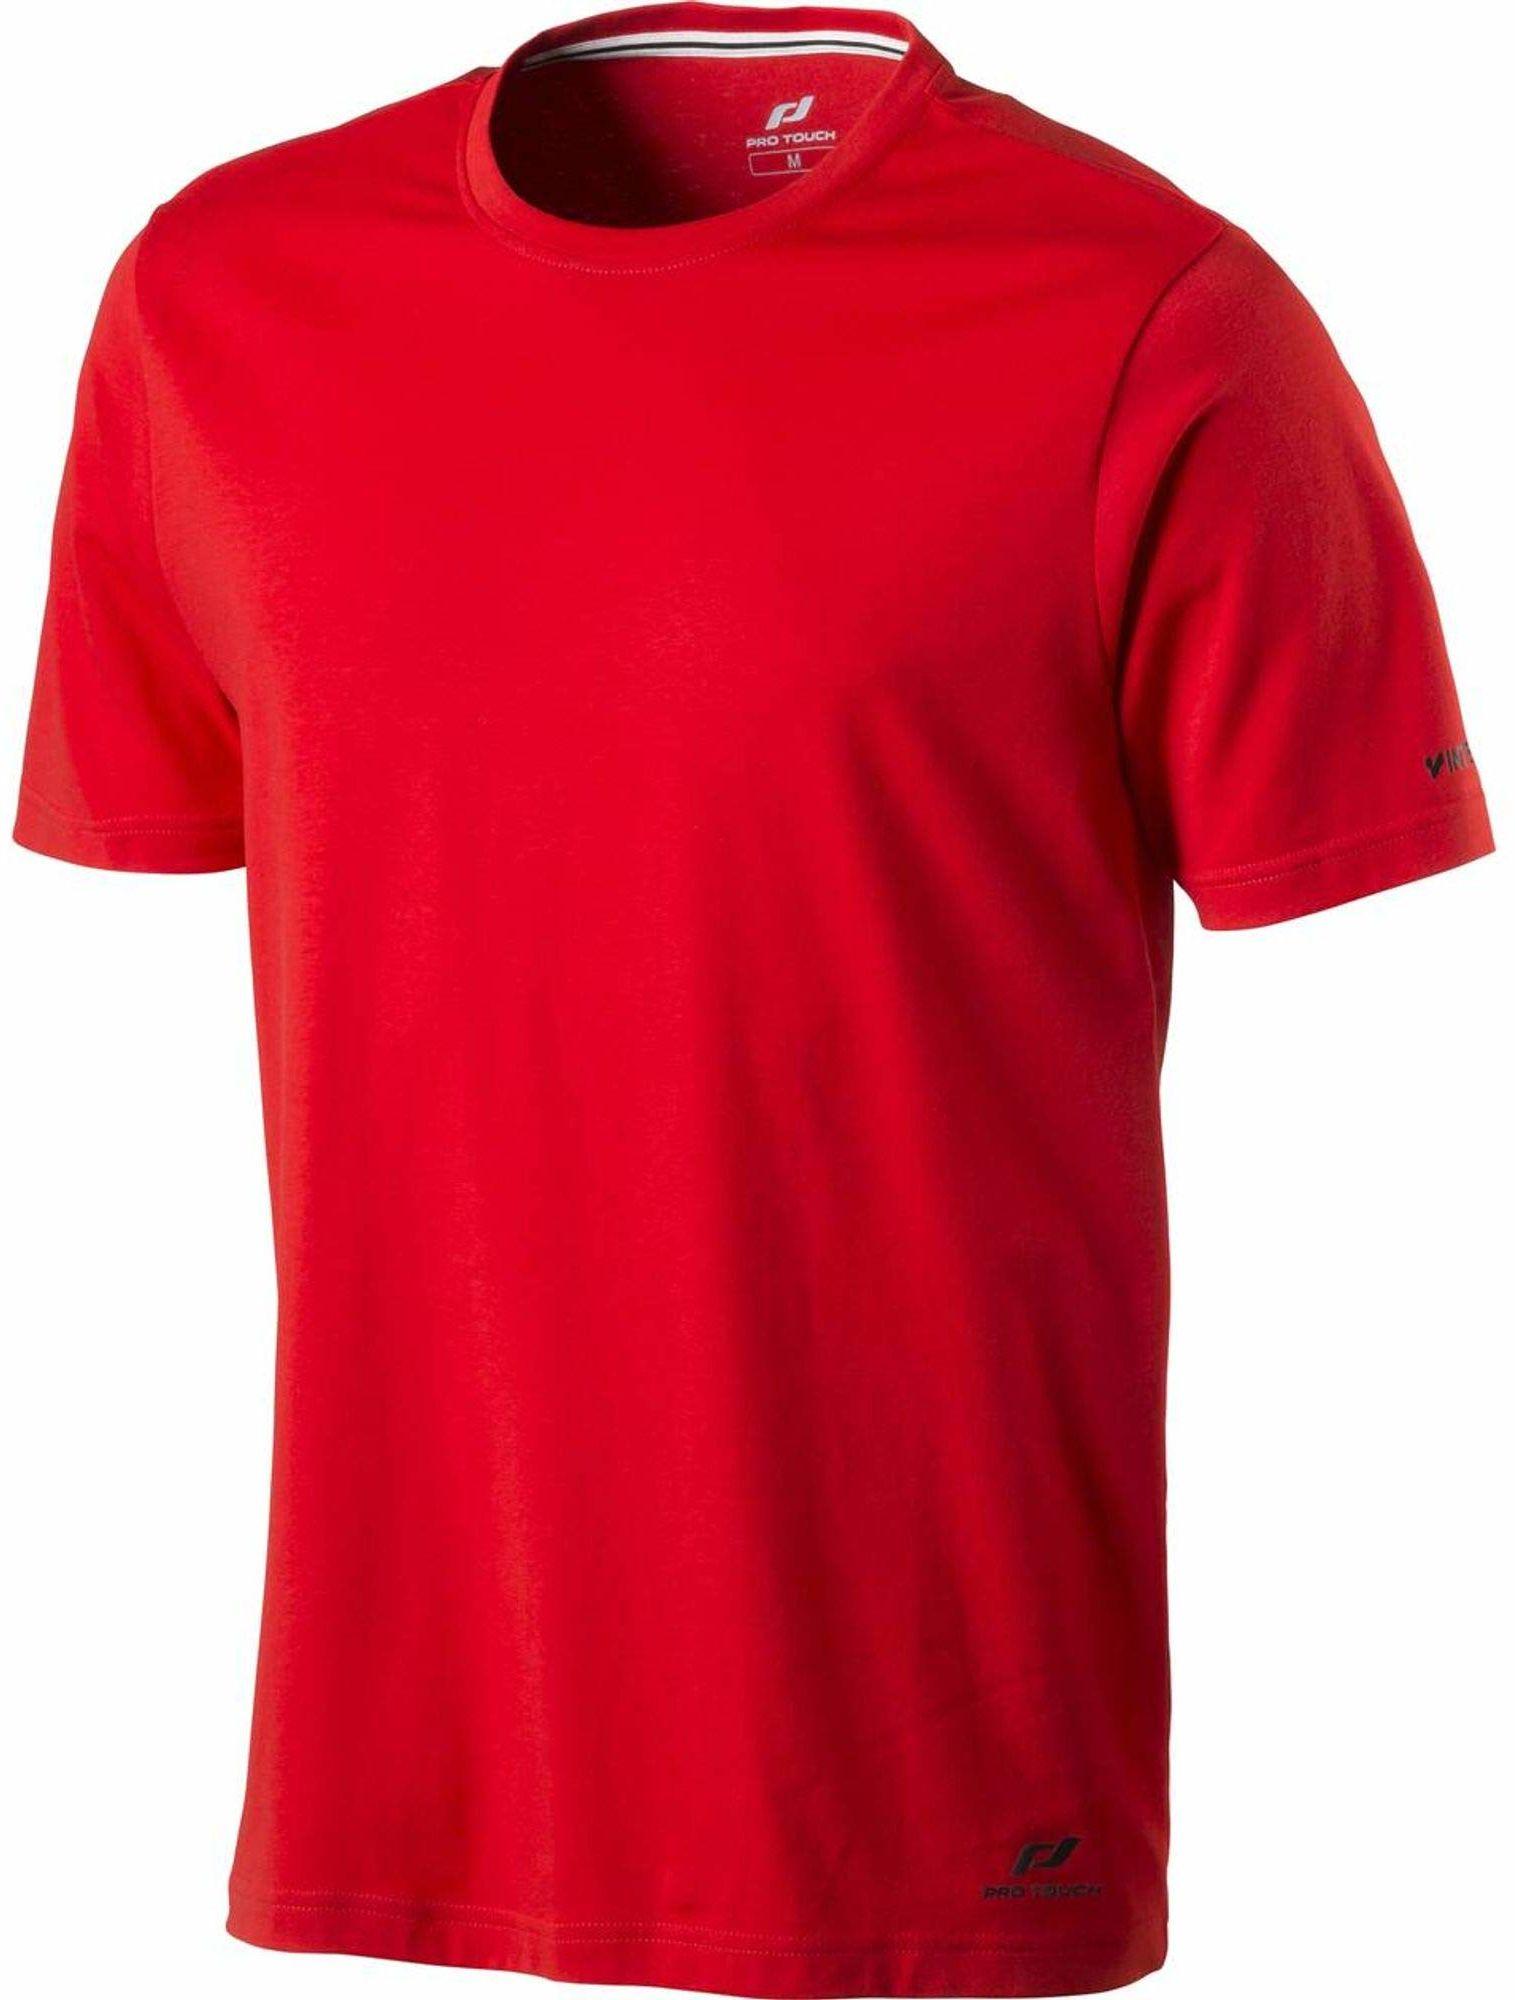 Pro Touch Promo męska koszulka, czerwona, S